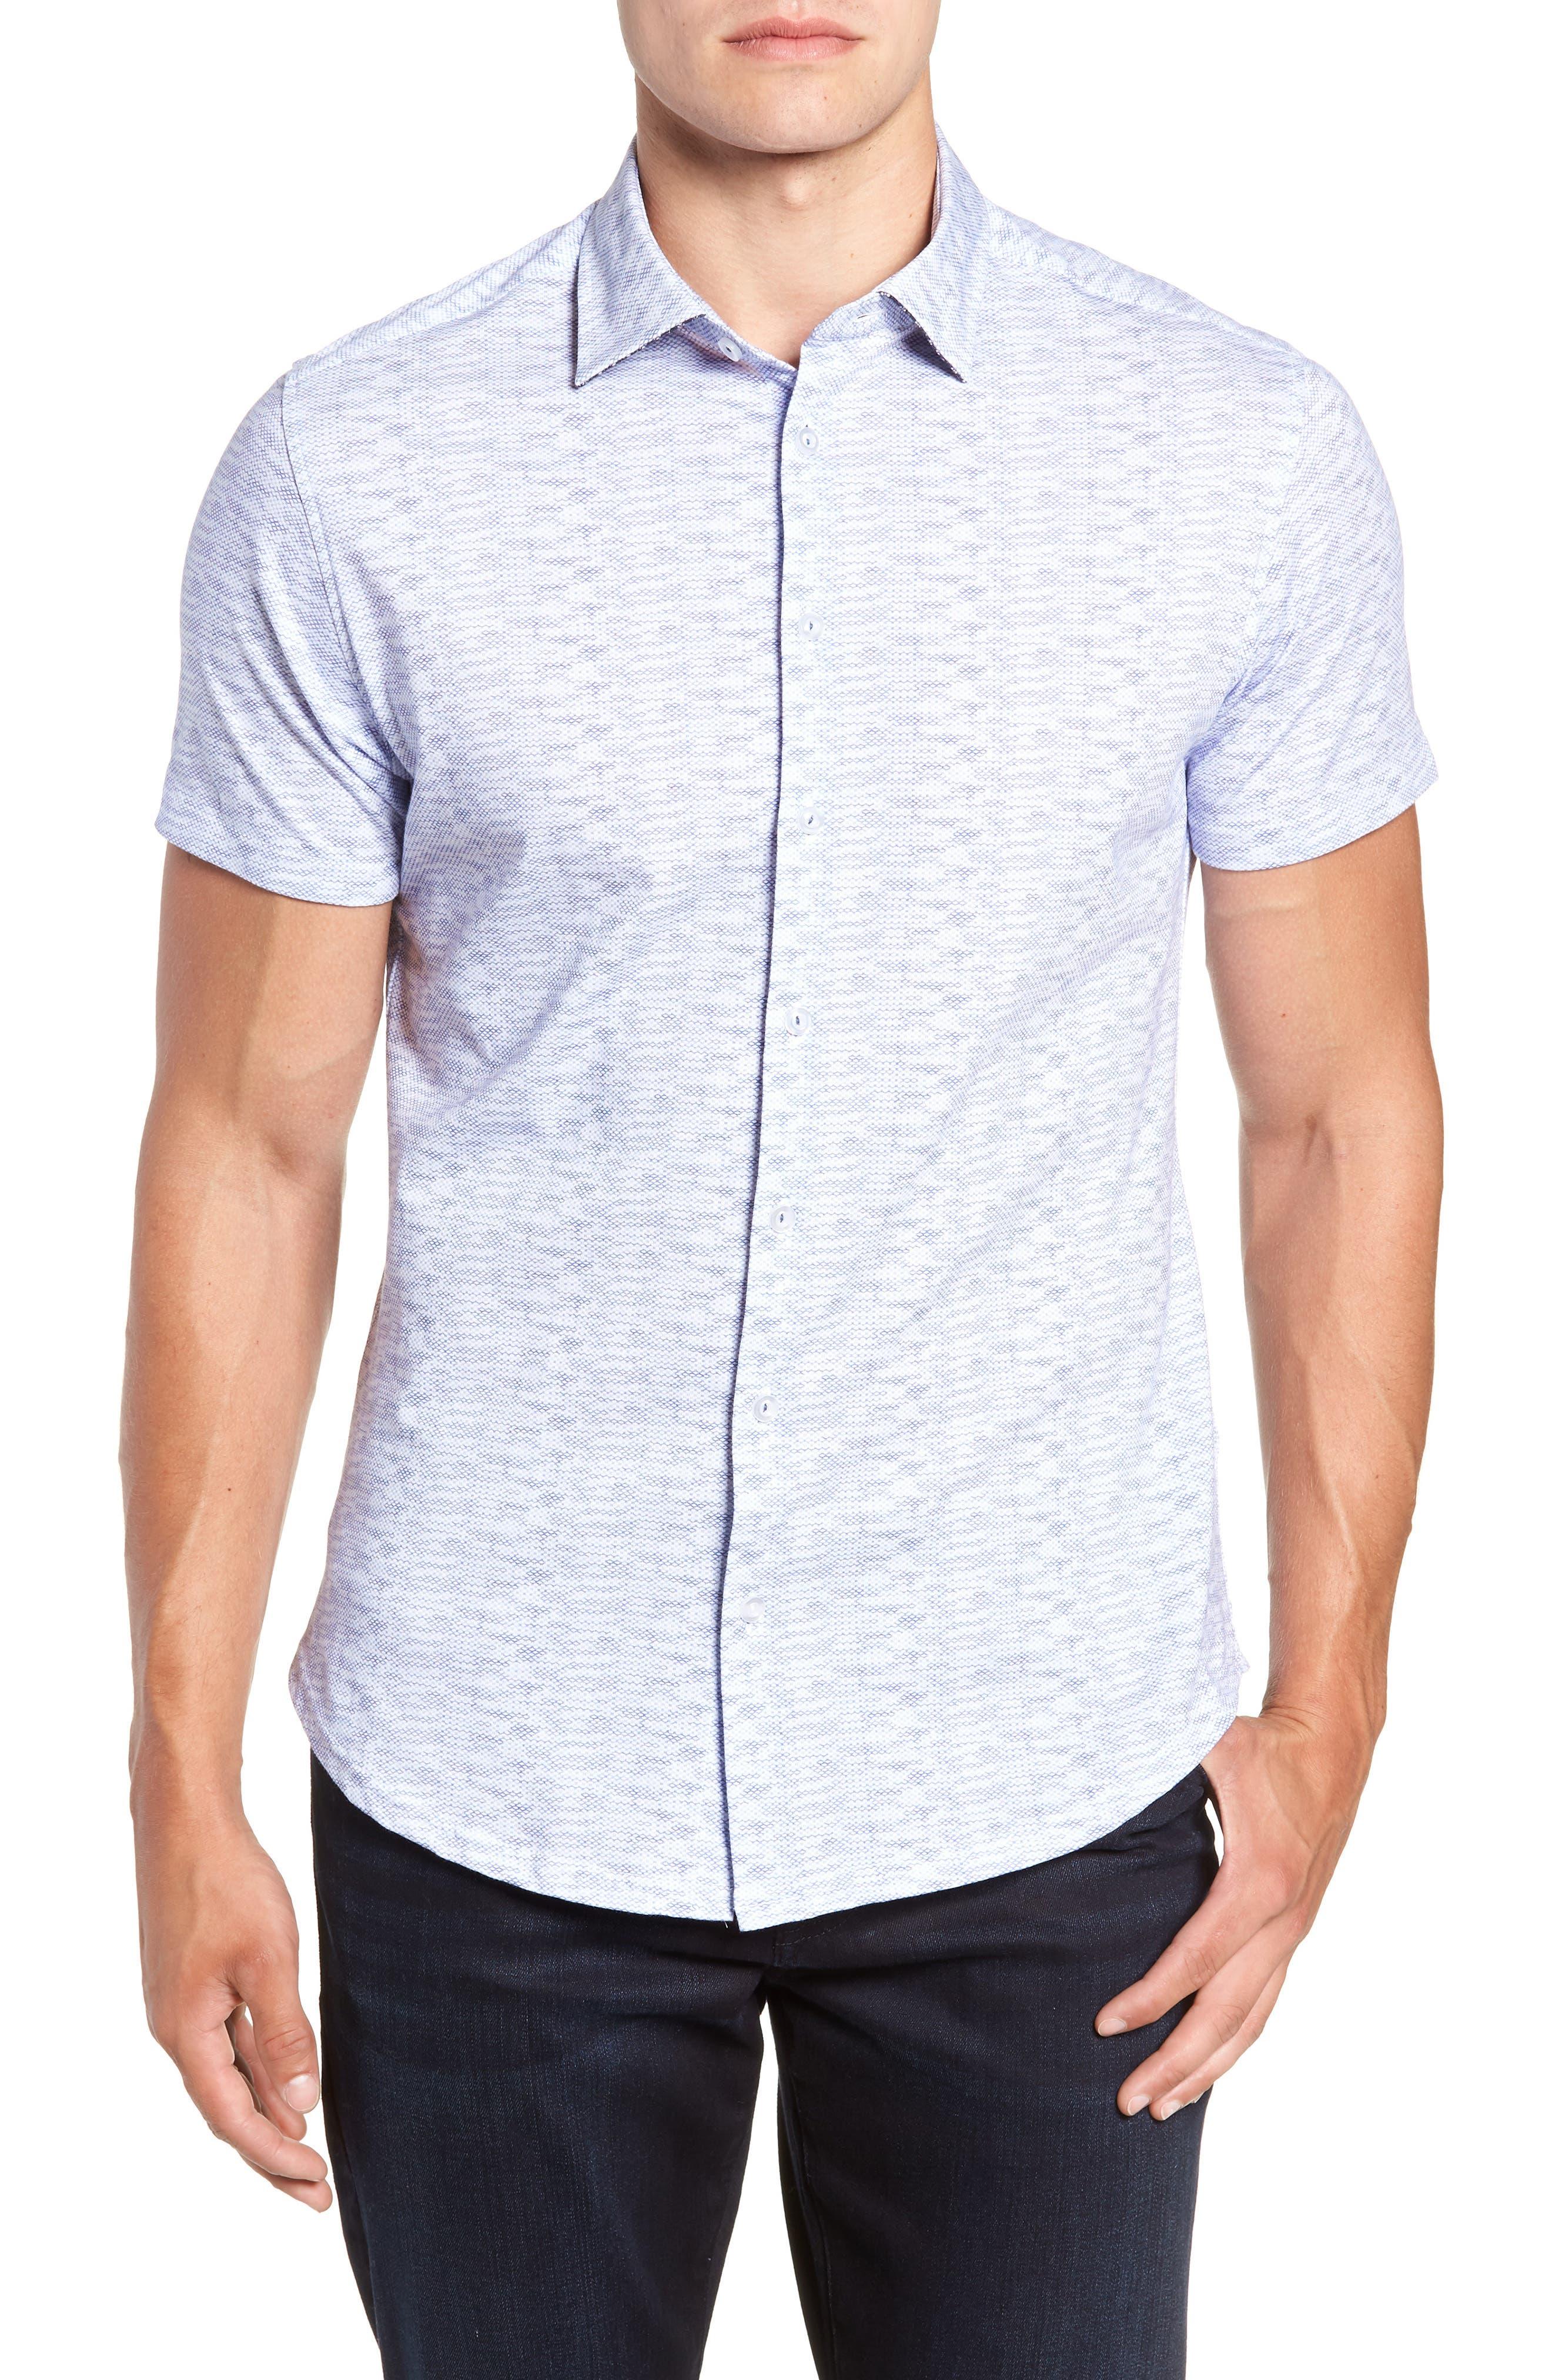 Heather Regular Fit Knit Sport Shirt,                         Main,                         color, 400